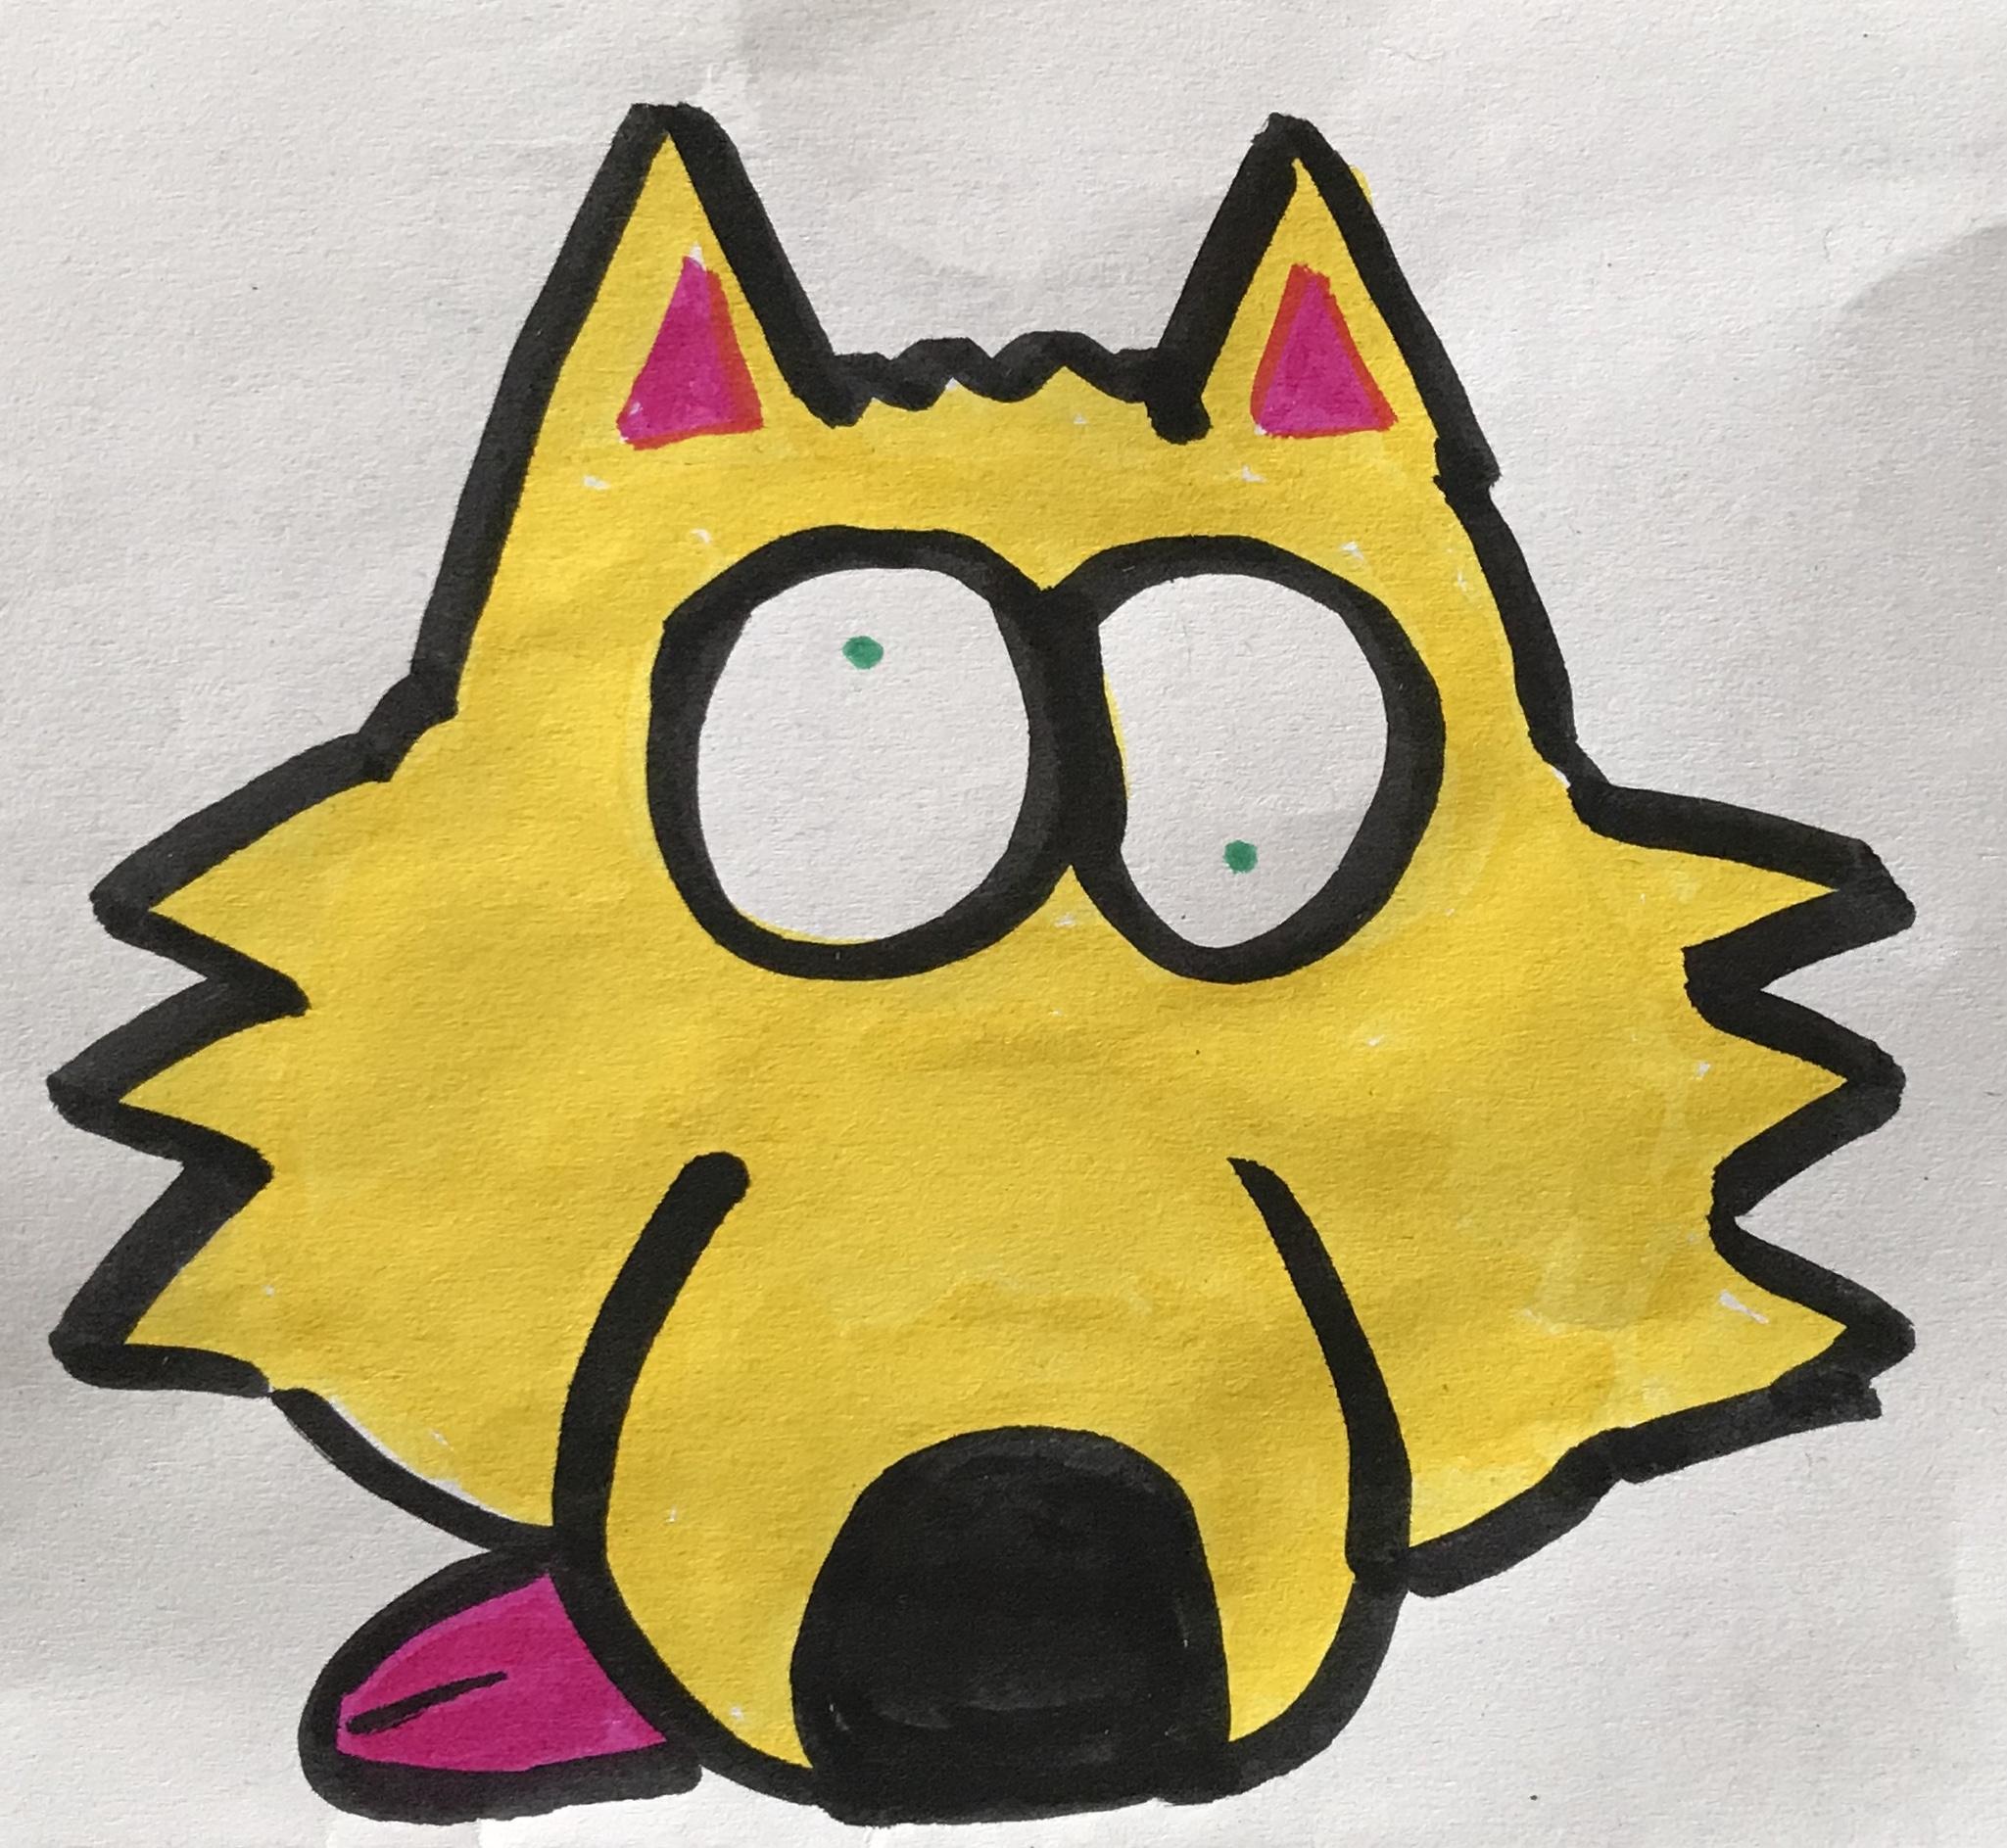 This wolf is a bit out of shape drawing artwork art marker sketch cartoon comic kawaii cute